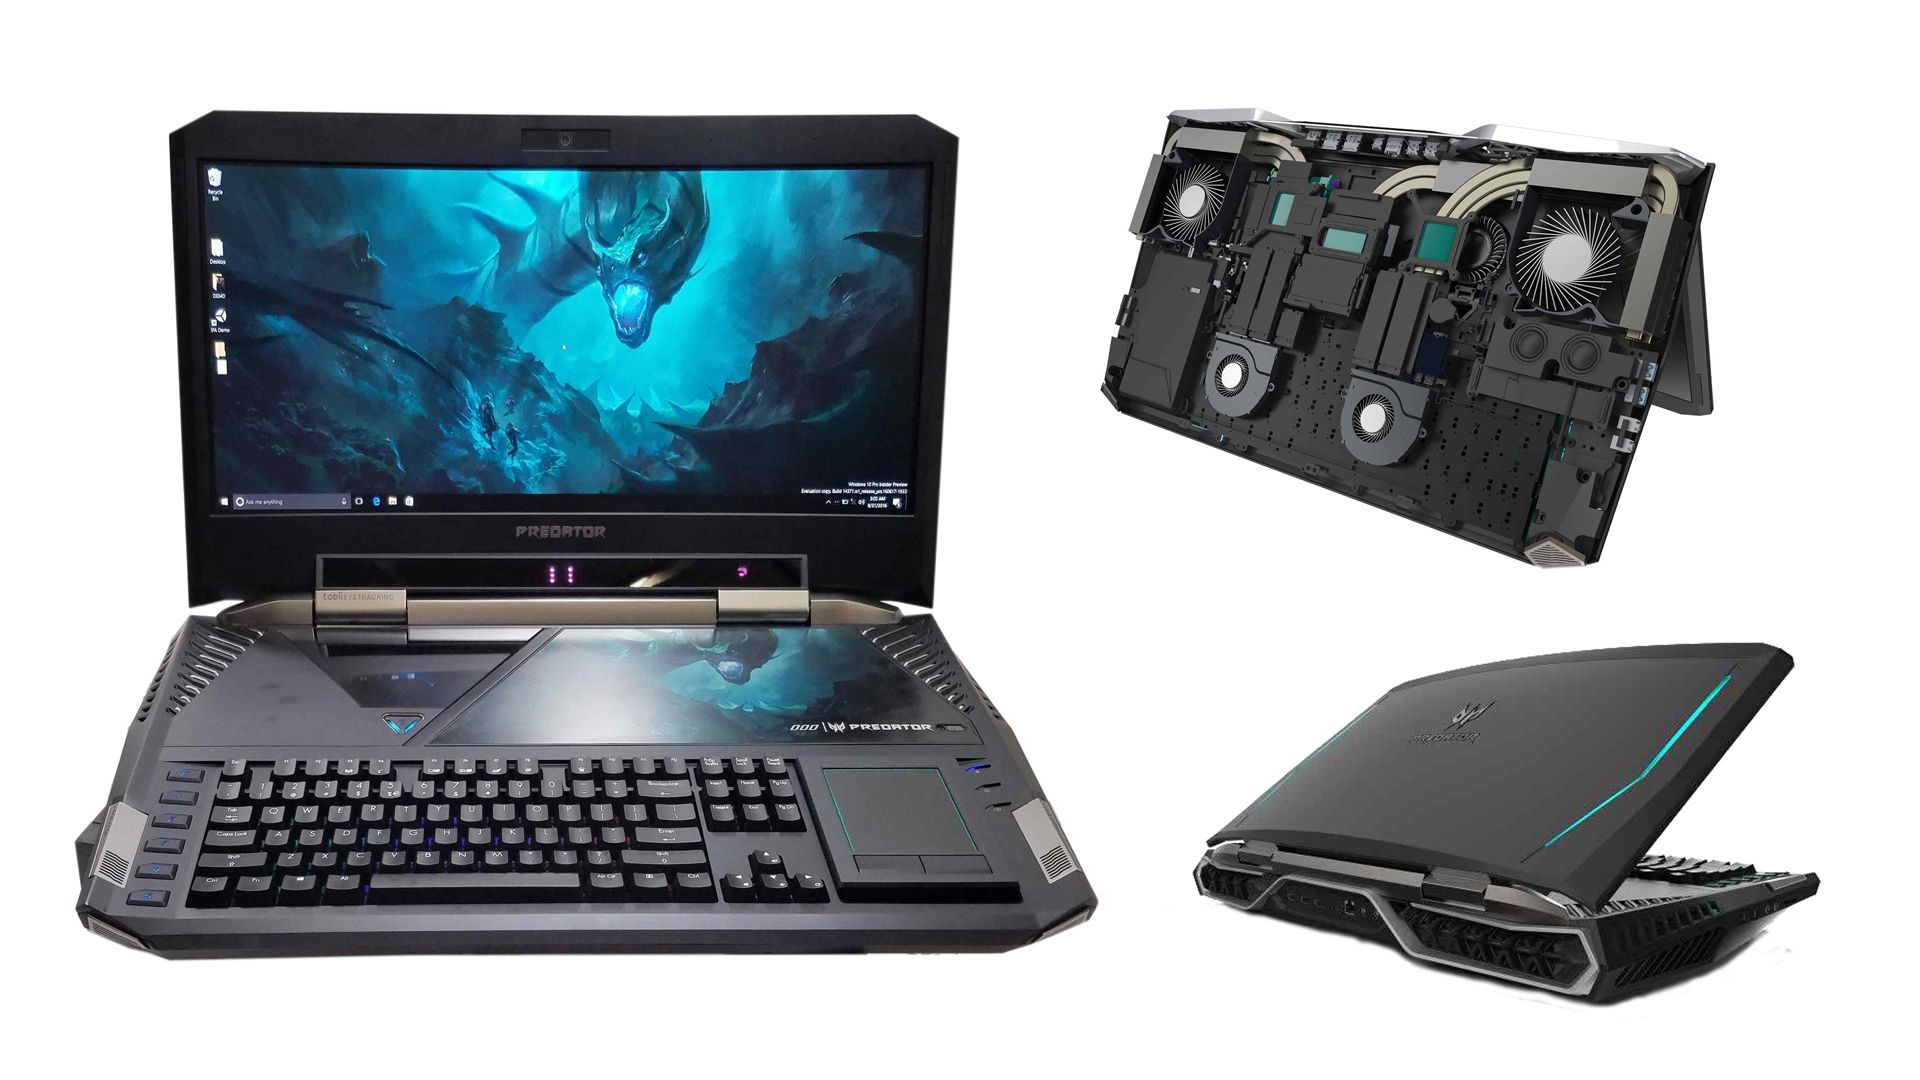 Acer S Monstrous Predator 21 X Gaming Laptop Priced At 8 999 Read More Http Bit Ly Acerpredator21x Best Gaming Laptop Gaming Laptops Laptop Computers